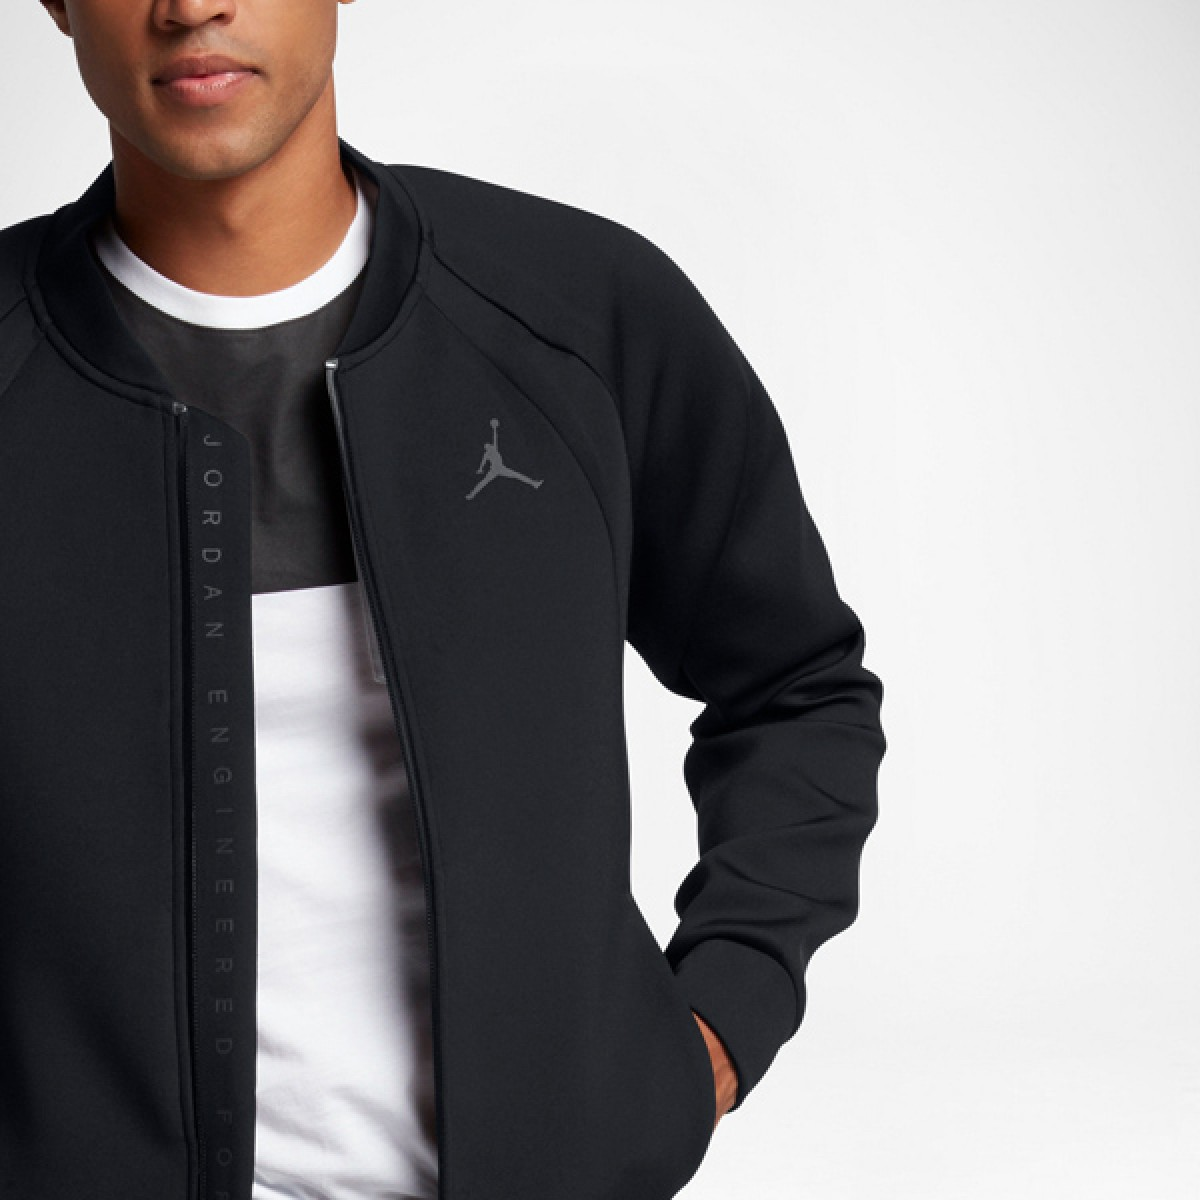 Jordan Flight Tech Jacket 'Black' 887776-010